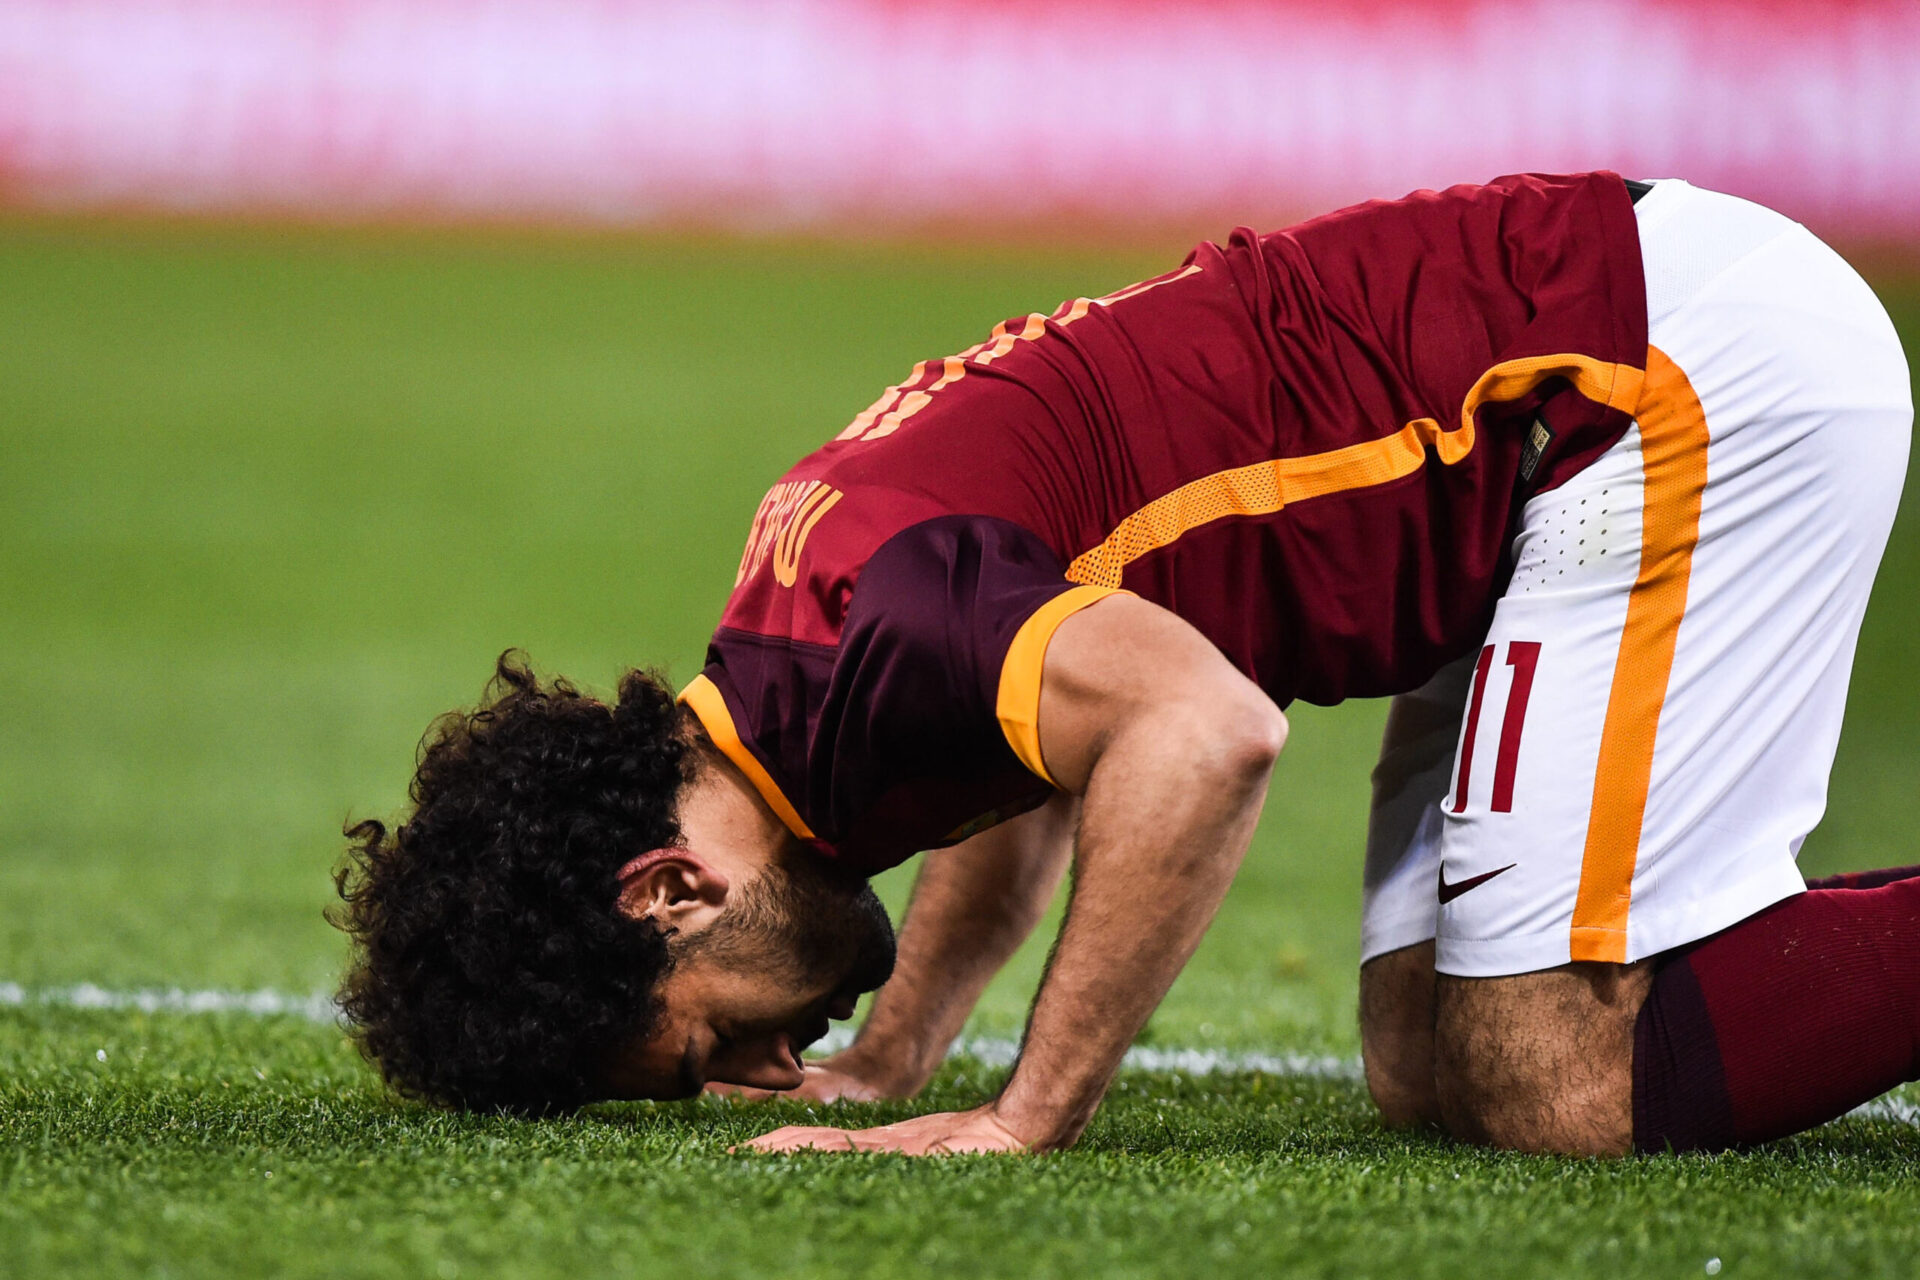 Mohamed Salah jouant avec l'équipe de Roma (Icon Sport)